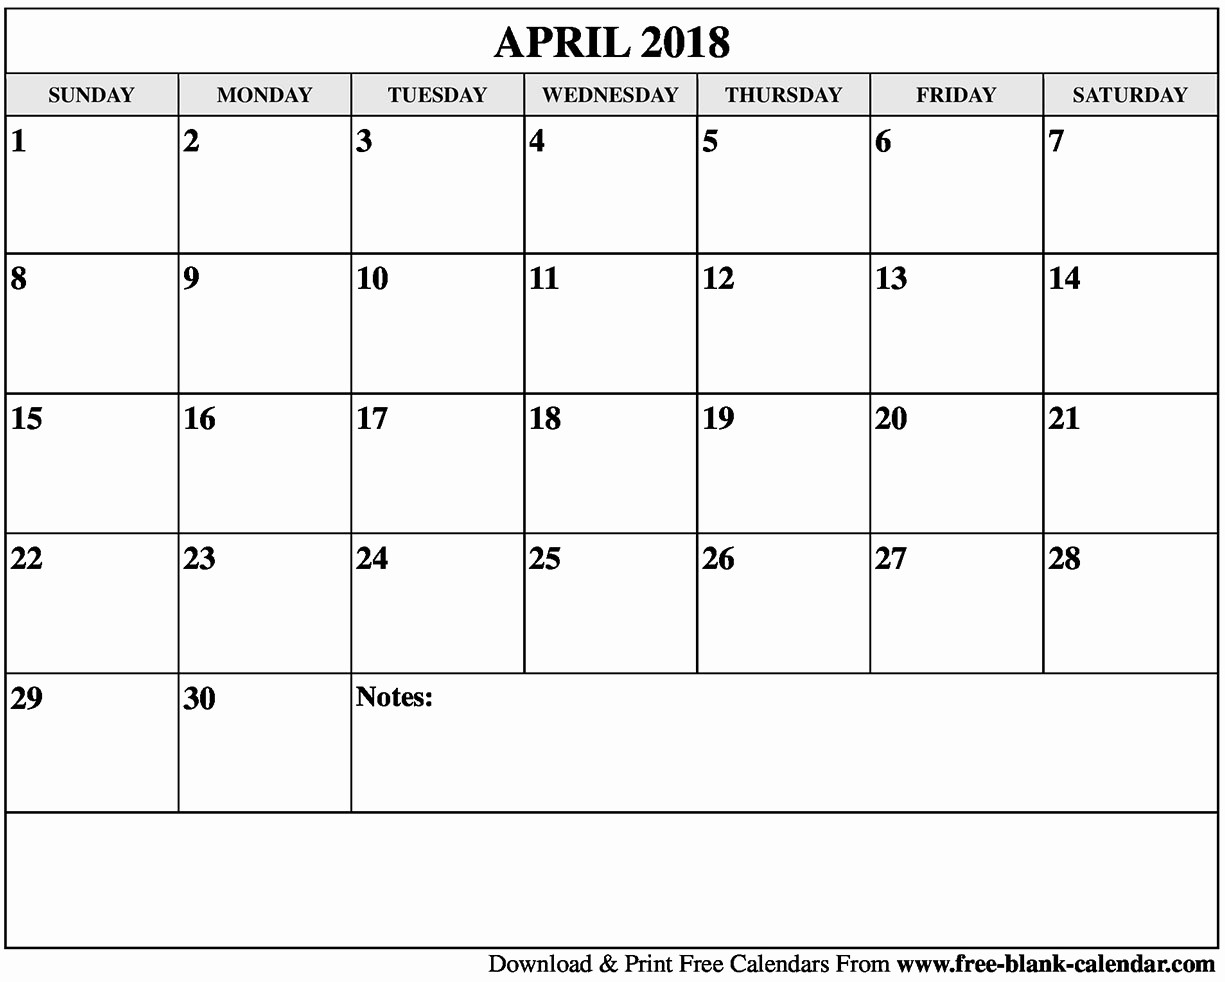 Blank April 2018 Calendar Template Luxury Blank April 2018 Calendar Printable